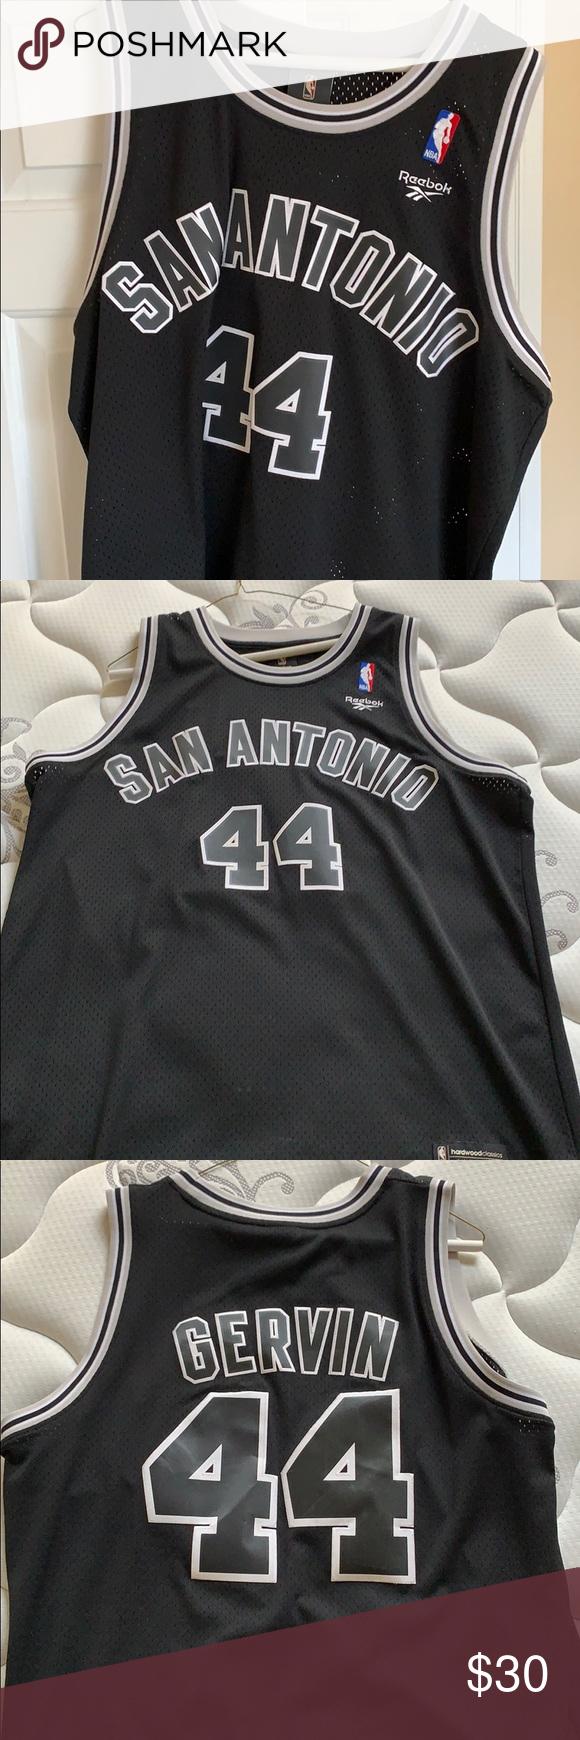 super cheap 3df39 850f2 George Gervin Throwback NBA Jersey San Antonio Gervin Jersey ...